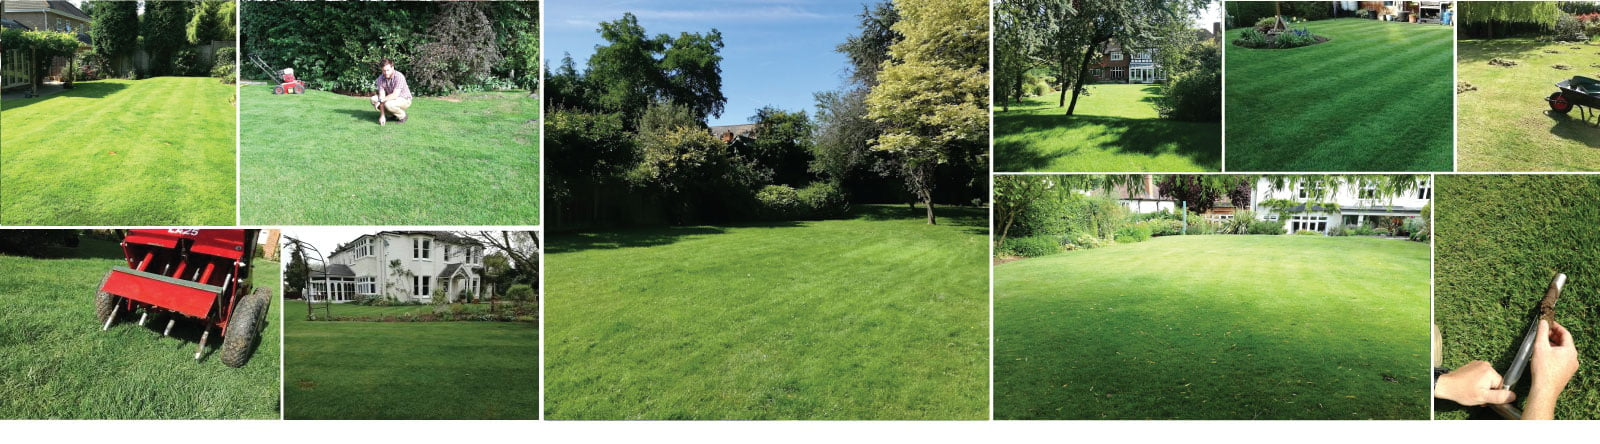 Surrey Lawn Care Customer Lawns